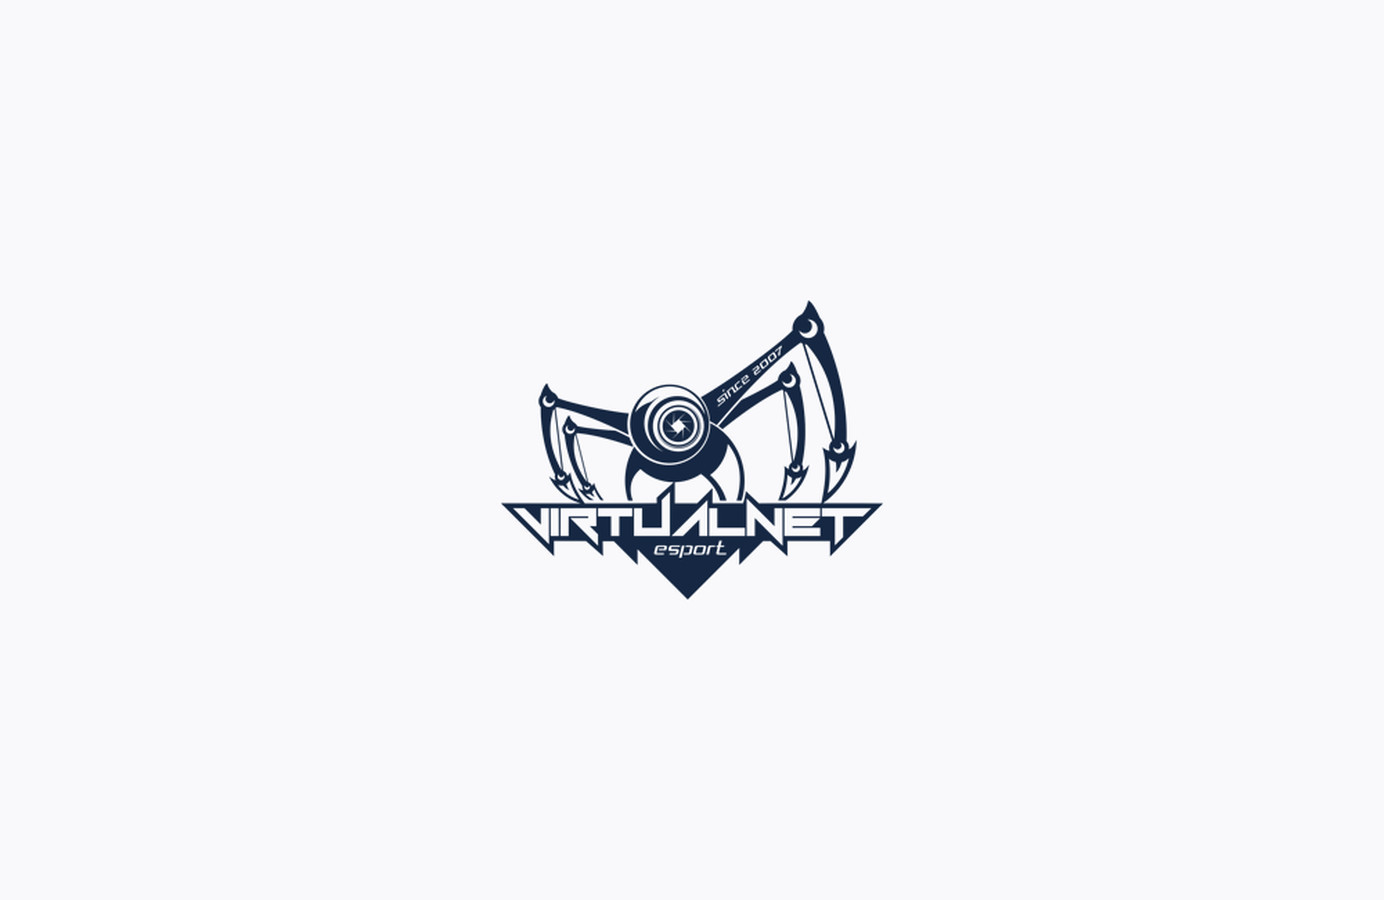 VirtualNet logotipas